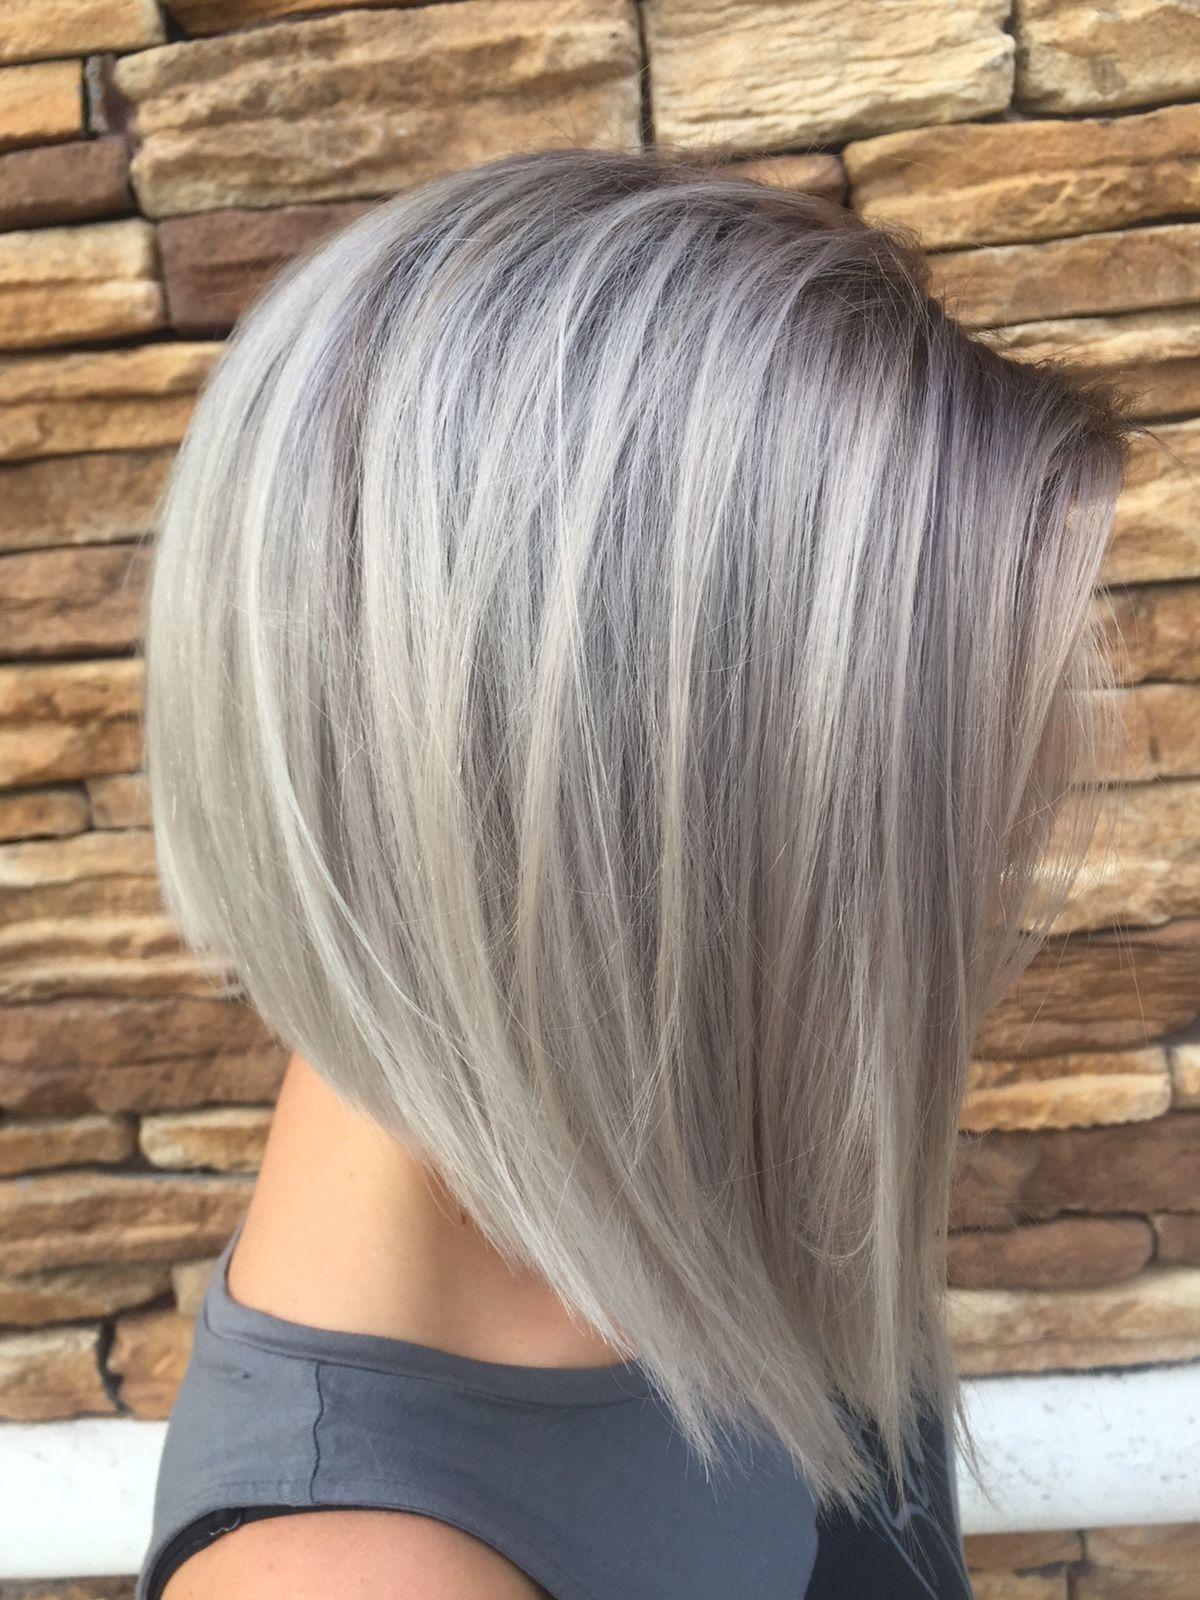 Beautiful Short Bob Hairstyles And Haircuts With Bangs Lovely hair